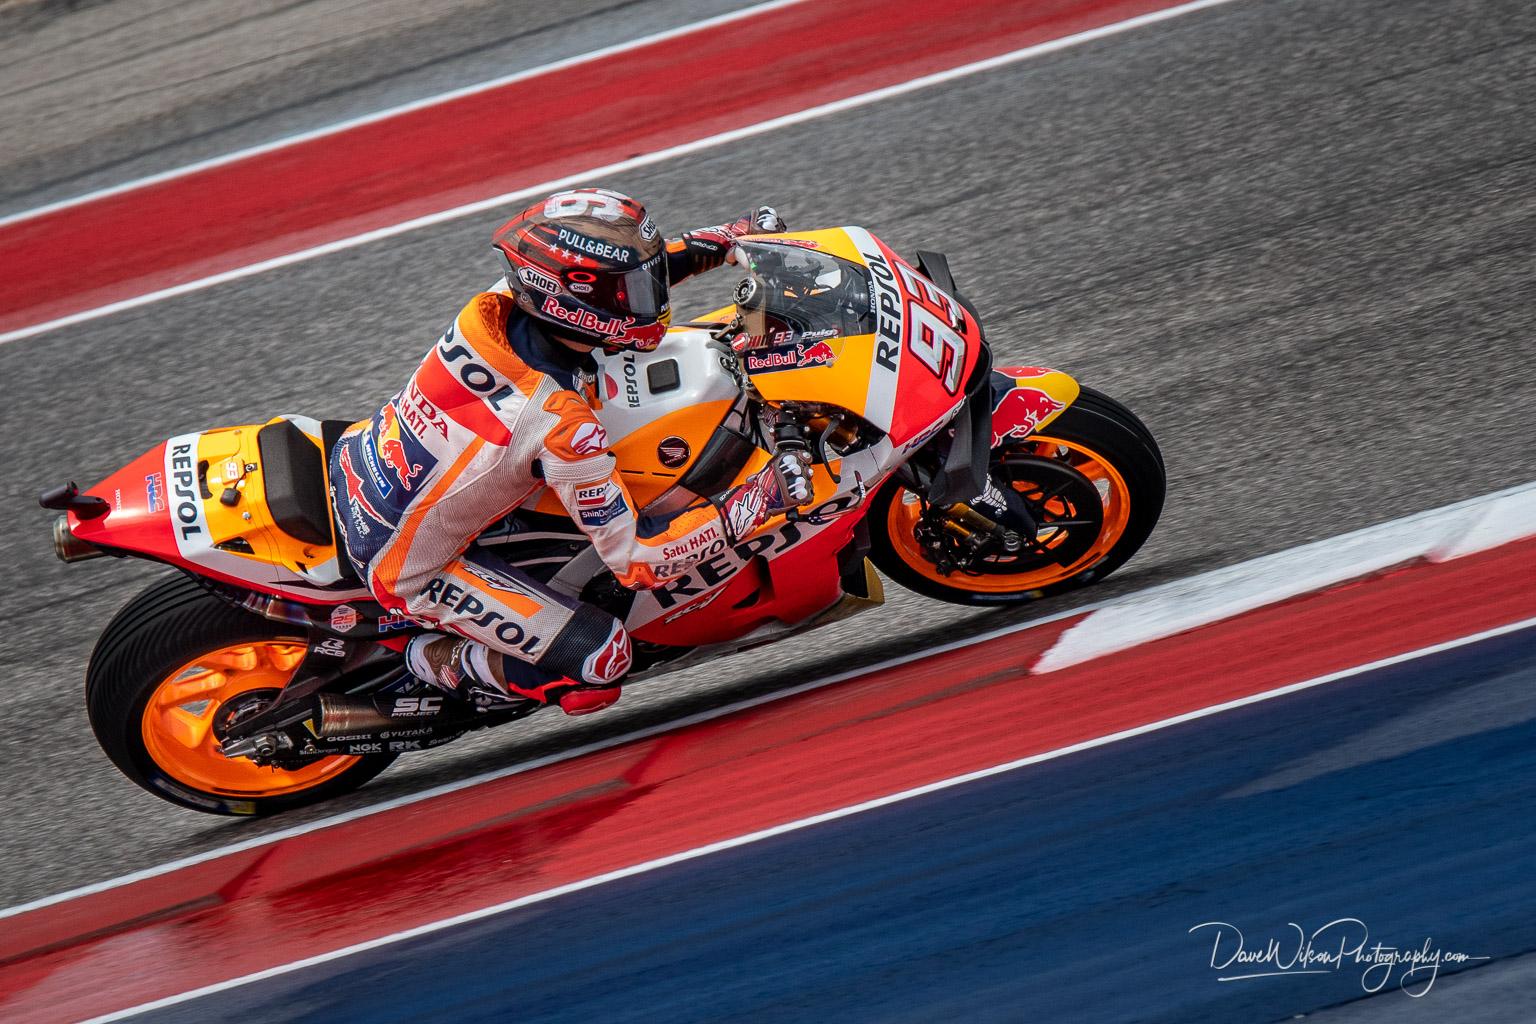 Marc Marquez, MotoGP 2019 ‹ Dave Wilson Photography